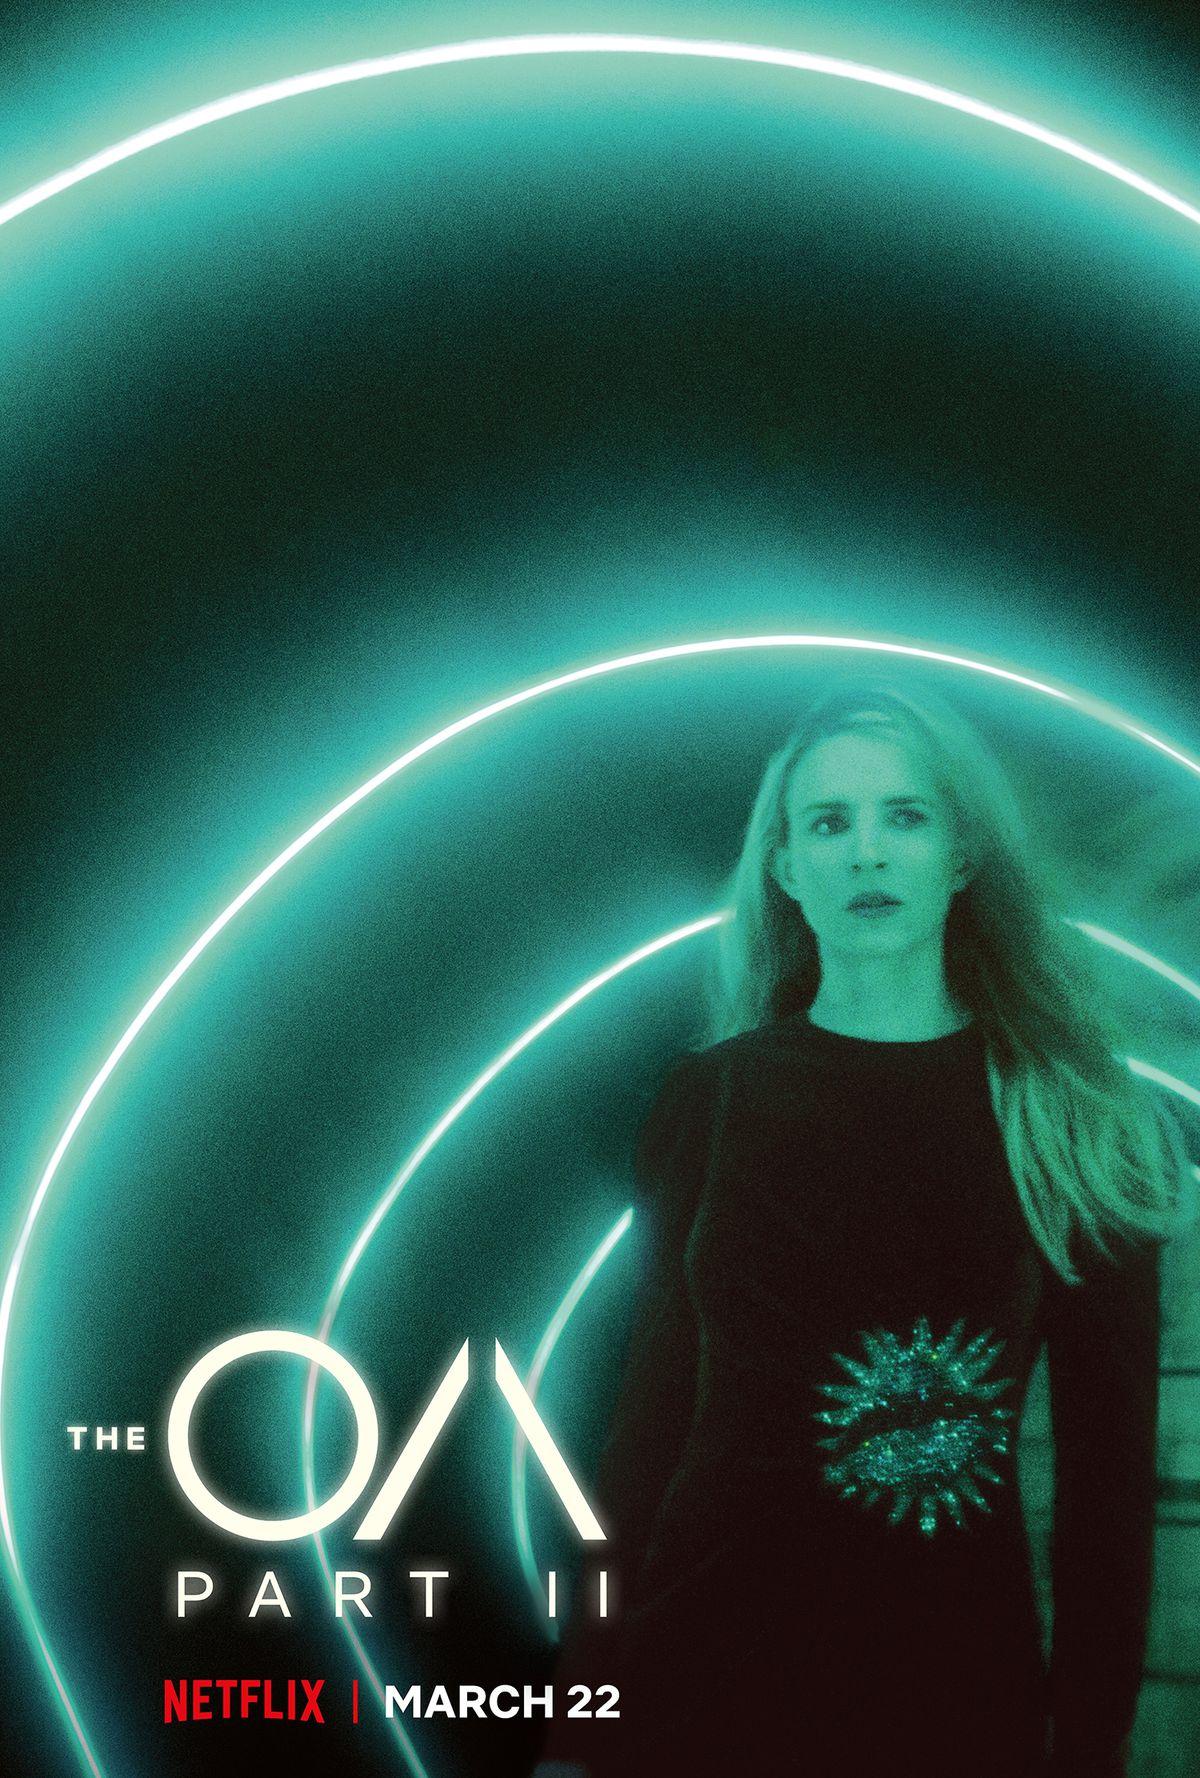 Netflix S The Oa Season 2 Trailer The Puzzle Gets Even